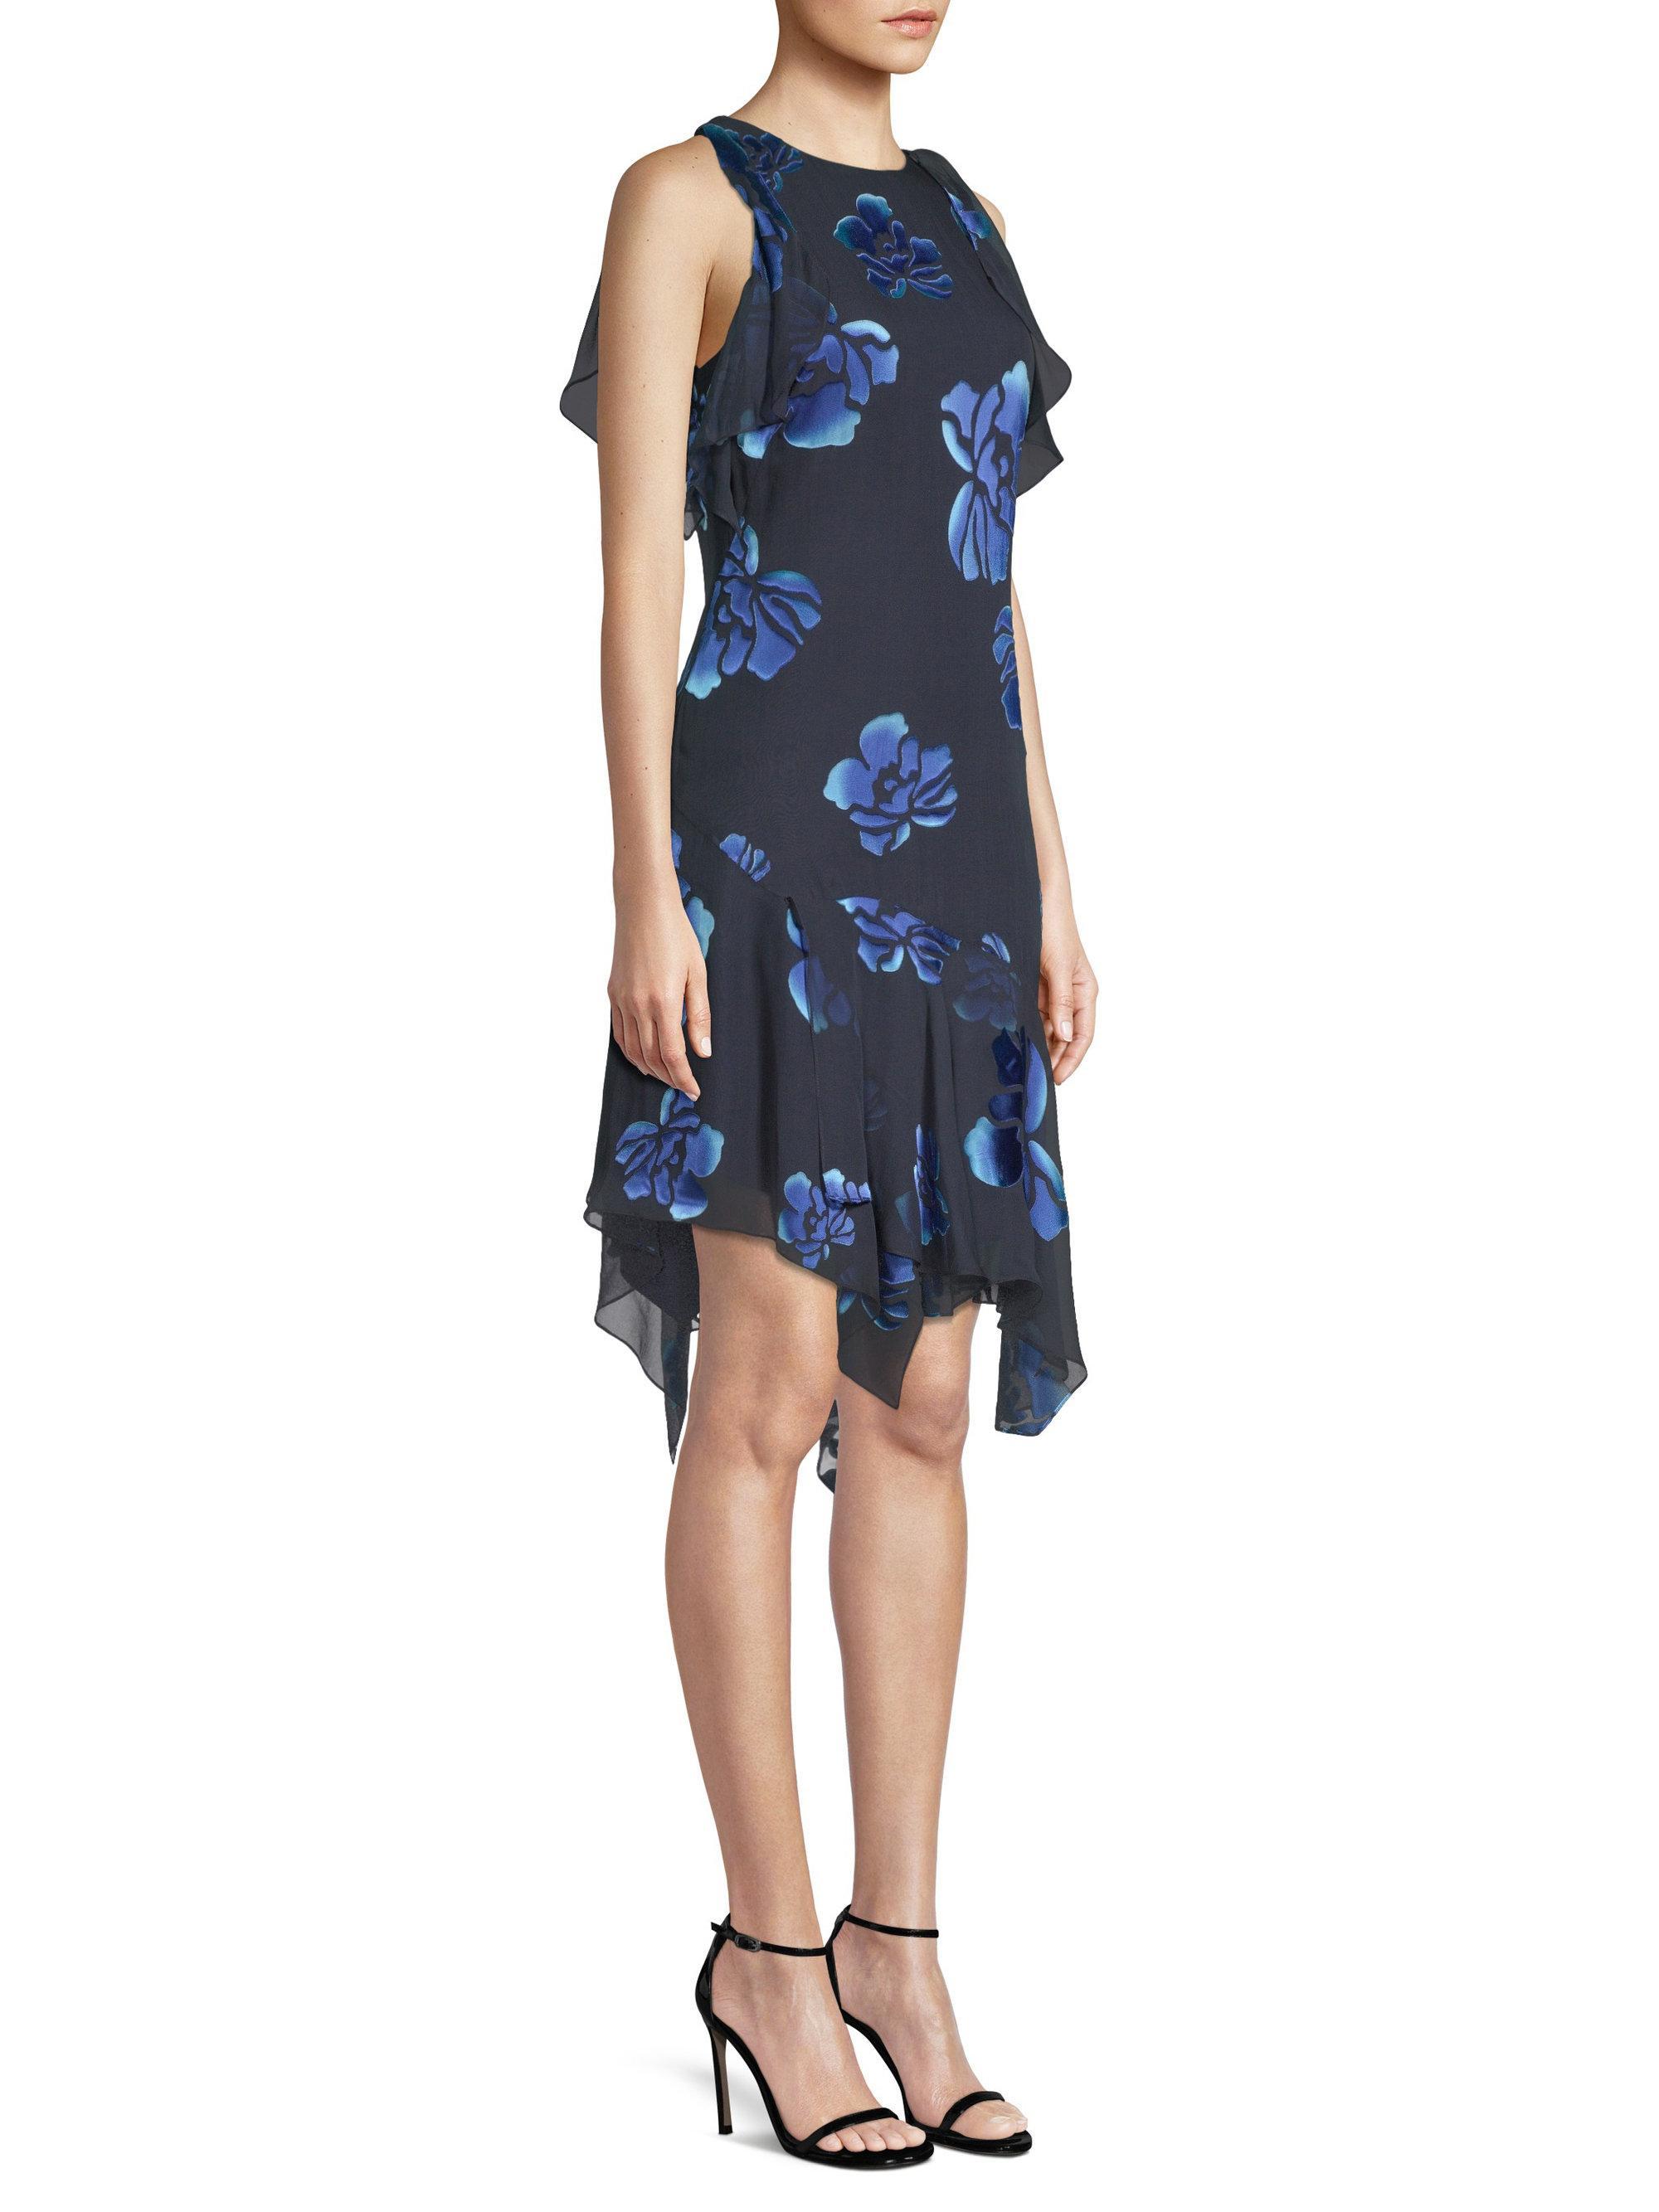 6cd62fe8a27a Elie Tahari Serenity Floral Handkerchief-hem Dress in Blue - Lyst